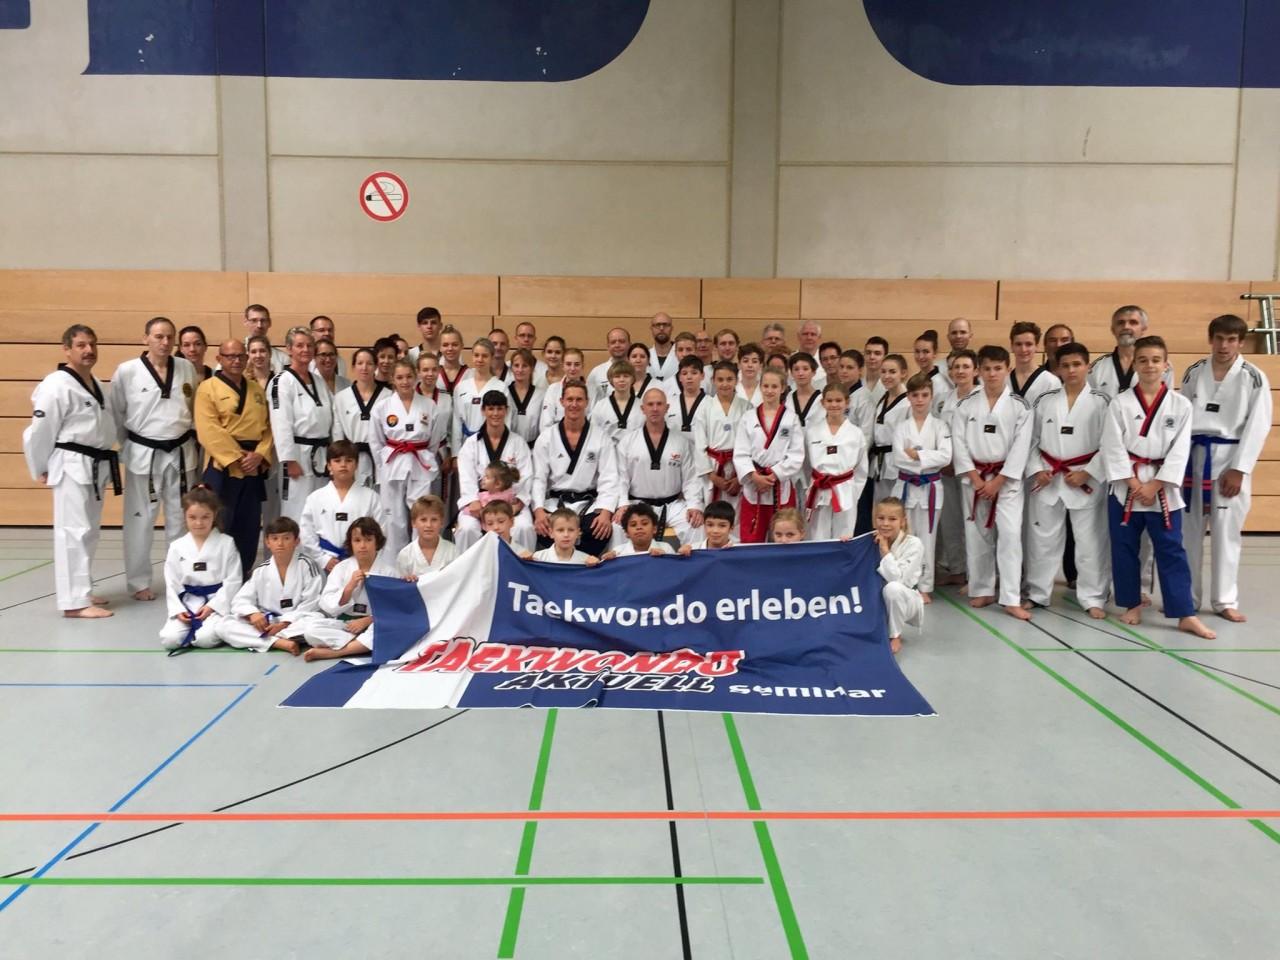 Taekwondo-Aktuell-Poomsea-Ketteni-Marcus-Nicole